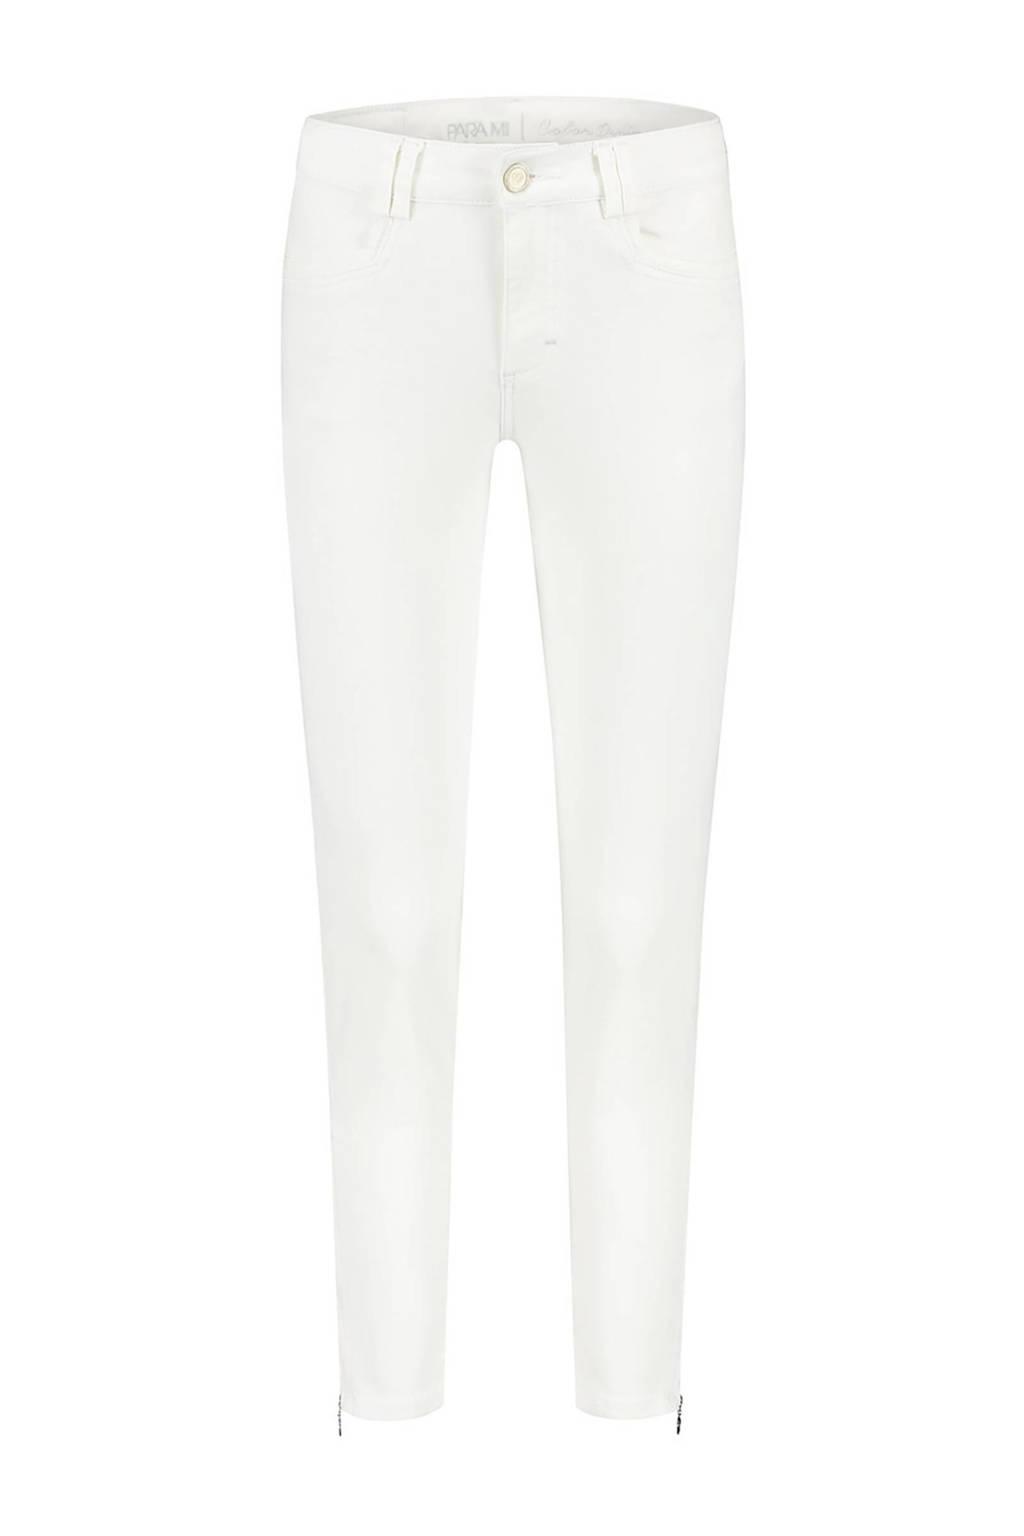 Para Mi high waist skinny jeans Amber 002 - white, 002 - White